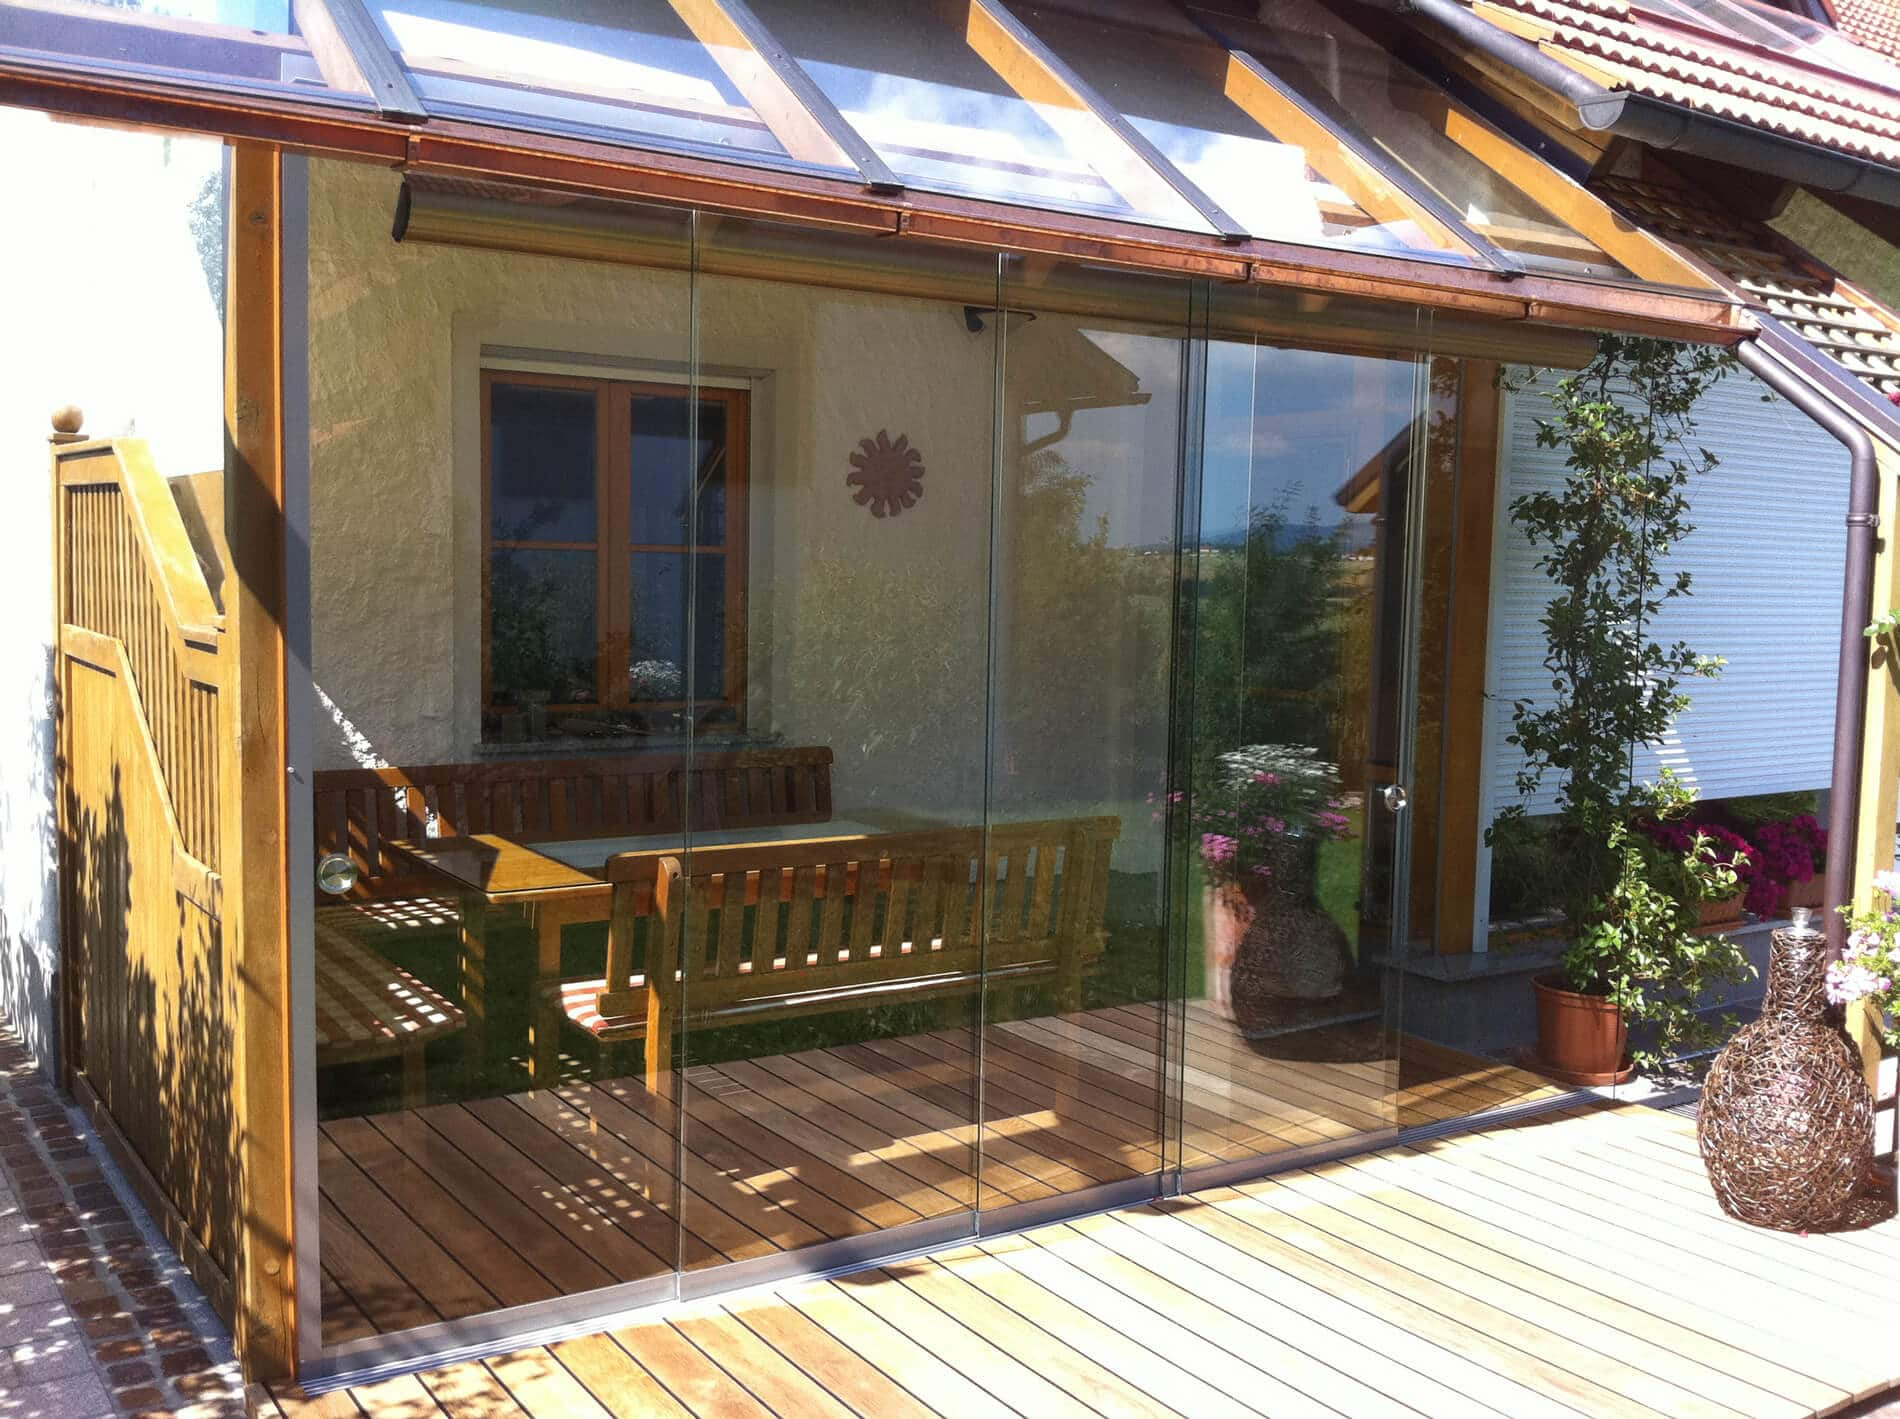 gastronomie wintergarten nach ma wintergarten schmidinger. Black Bedroom Furniture Sets. Home Design Ideas